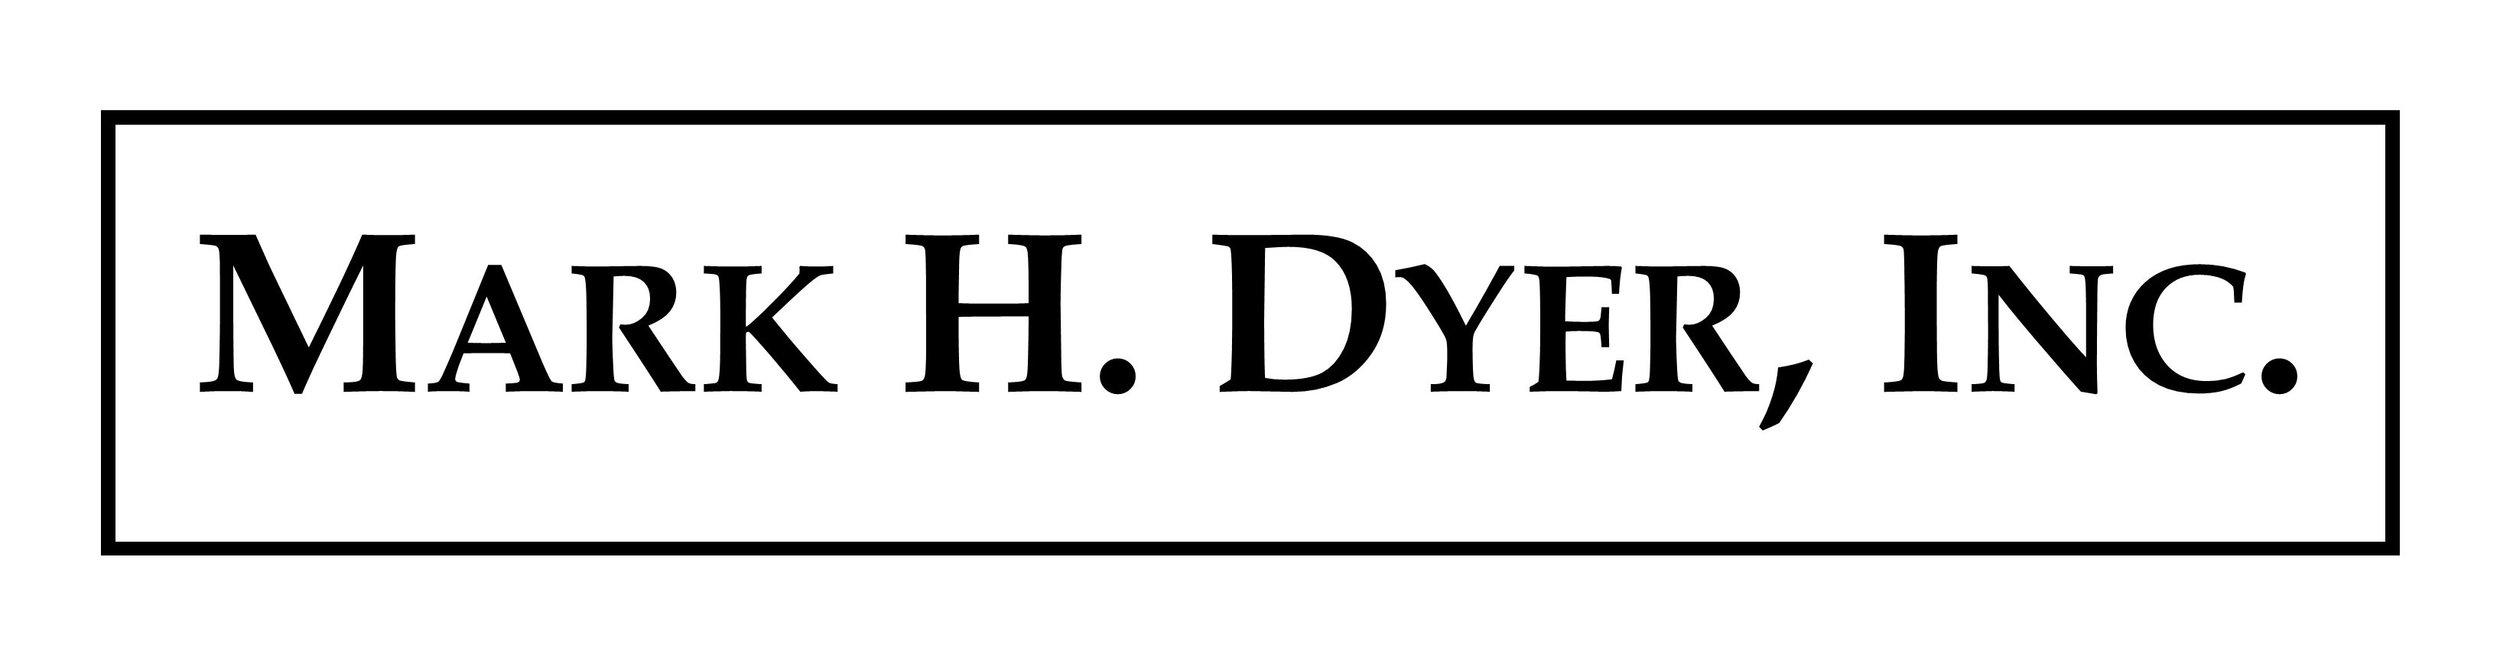 Mark Dyer Inc.jpg